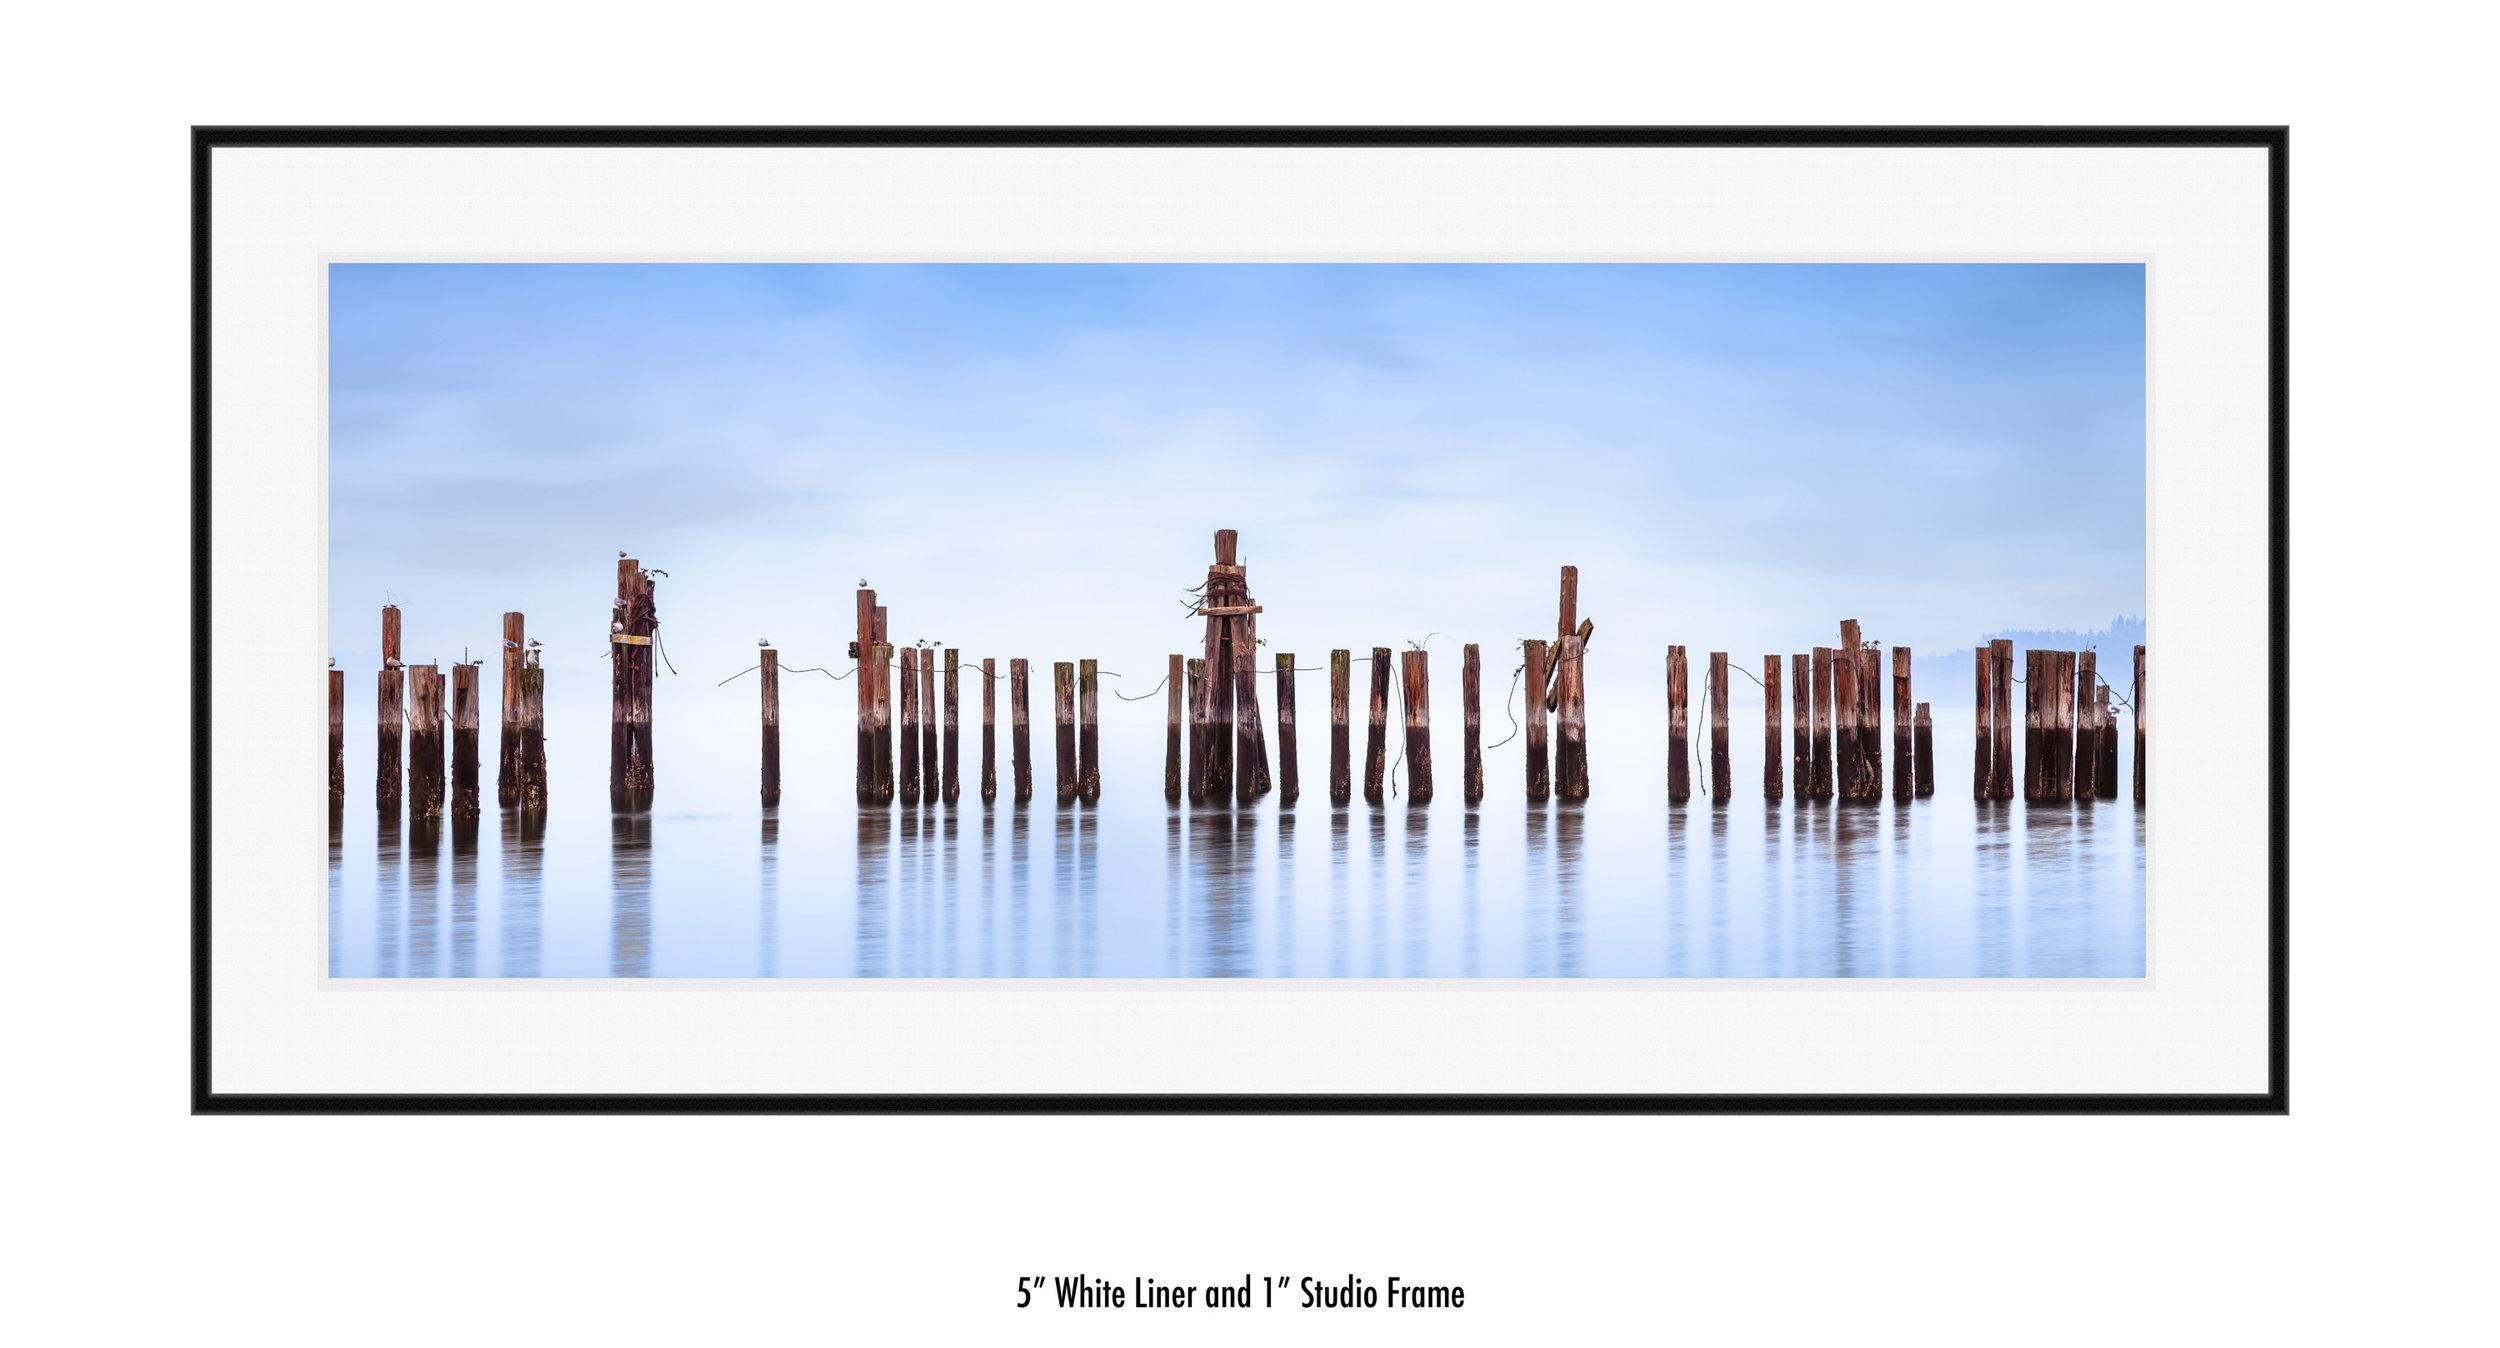 Concordia-wht-liner-blk-frame.jpg